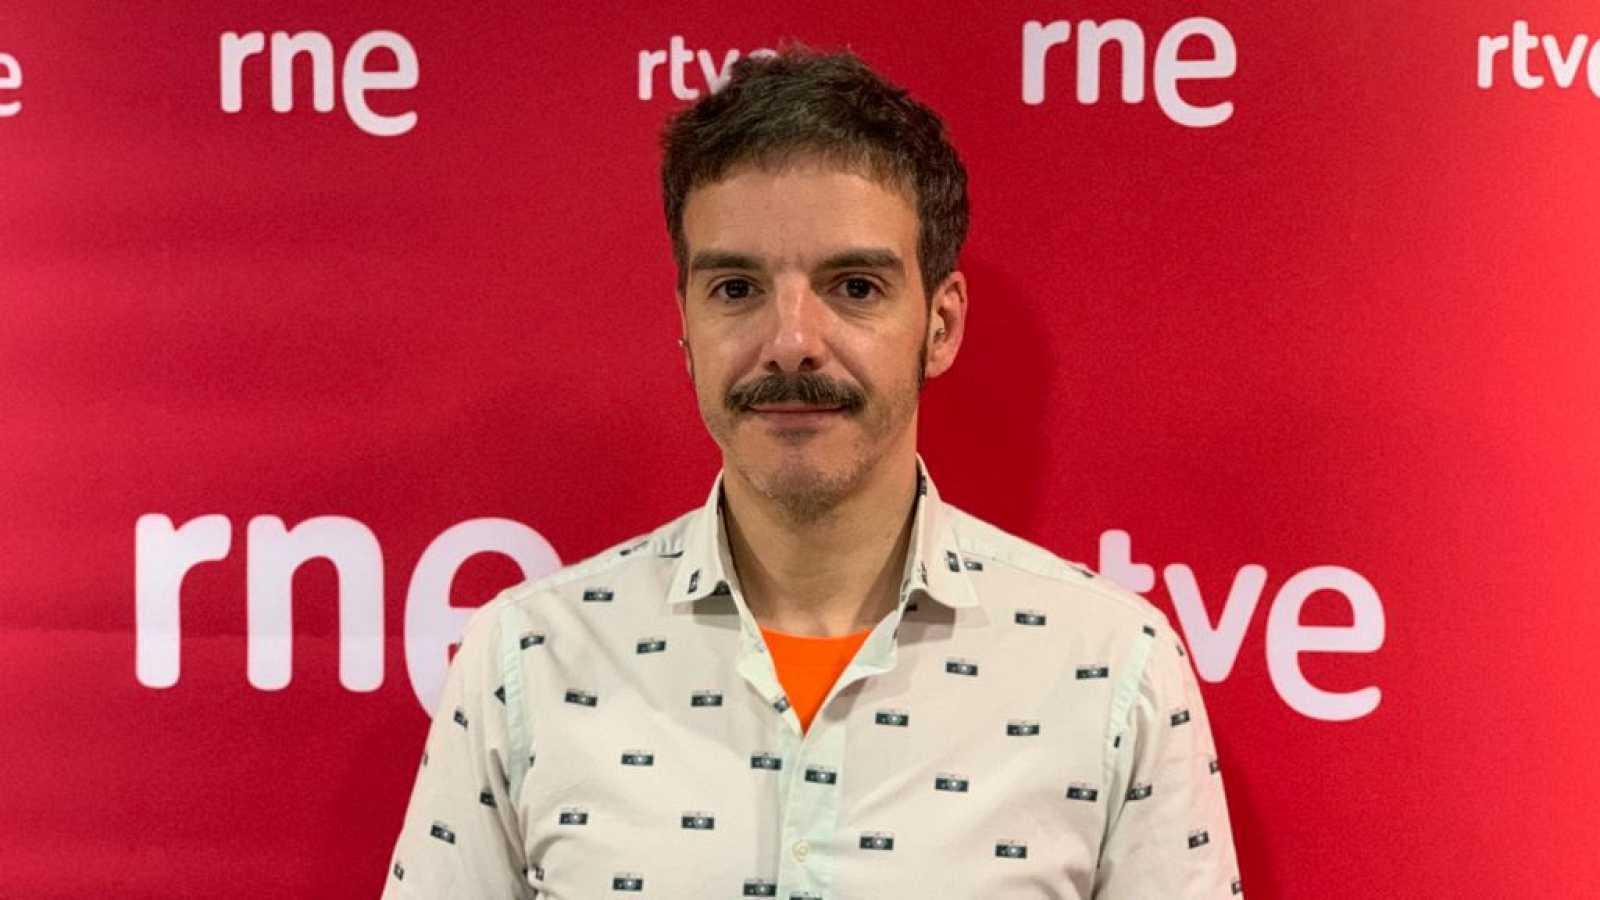 De boca a orella - Entrevista a Javier Giner